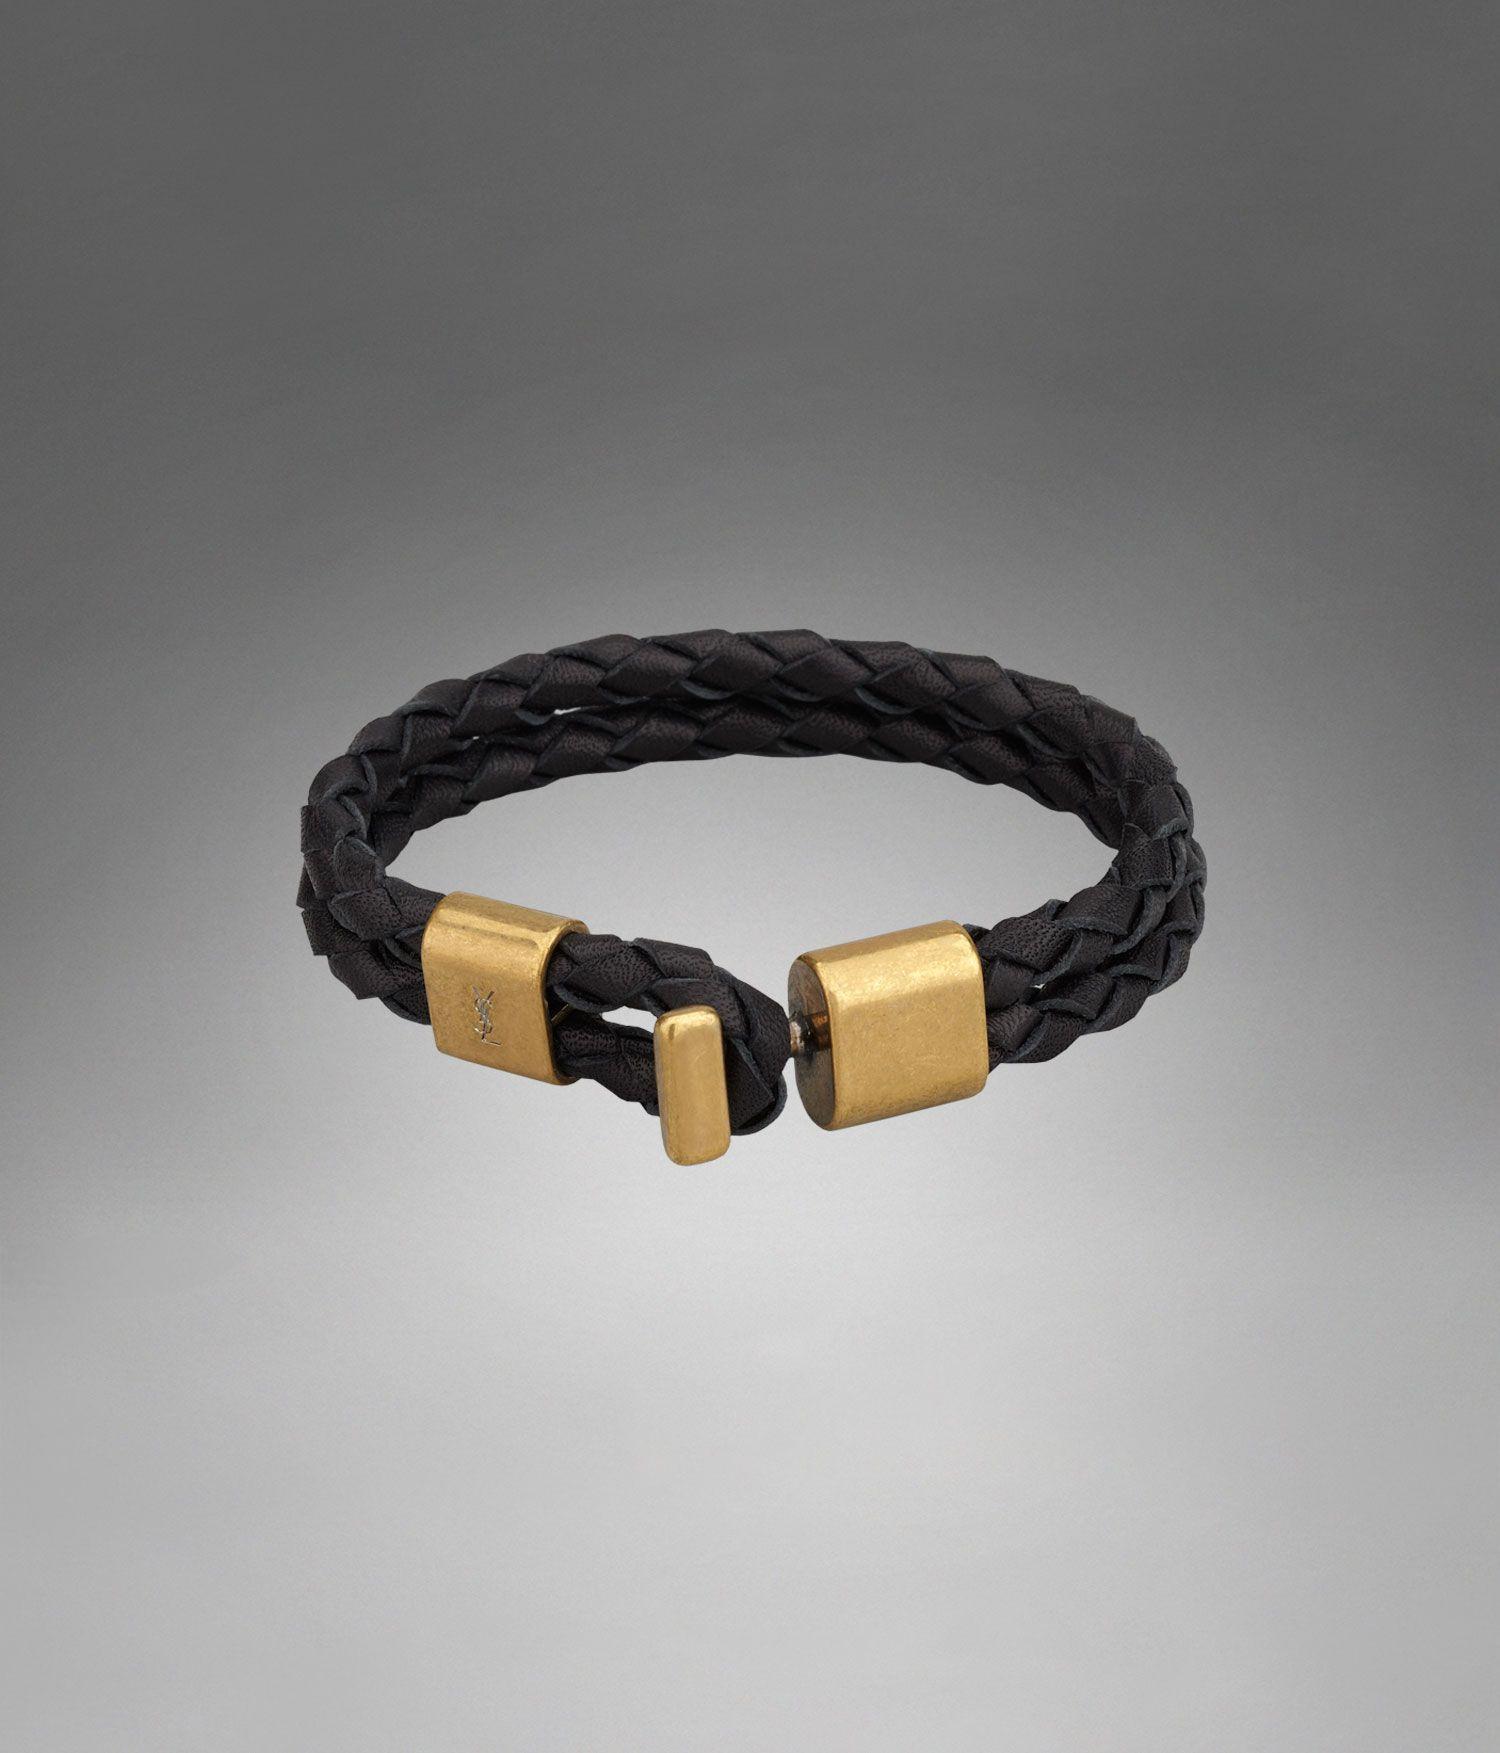 50c4f93340 YSL Braided Double Strap Bracelet in Black Leather - Jewelry ...